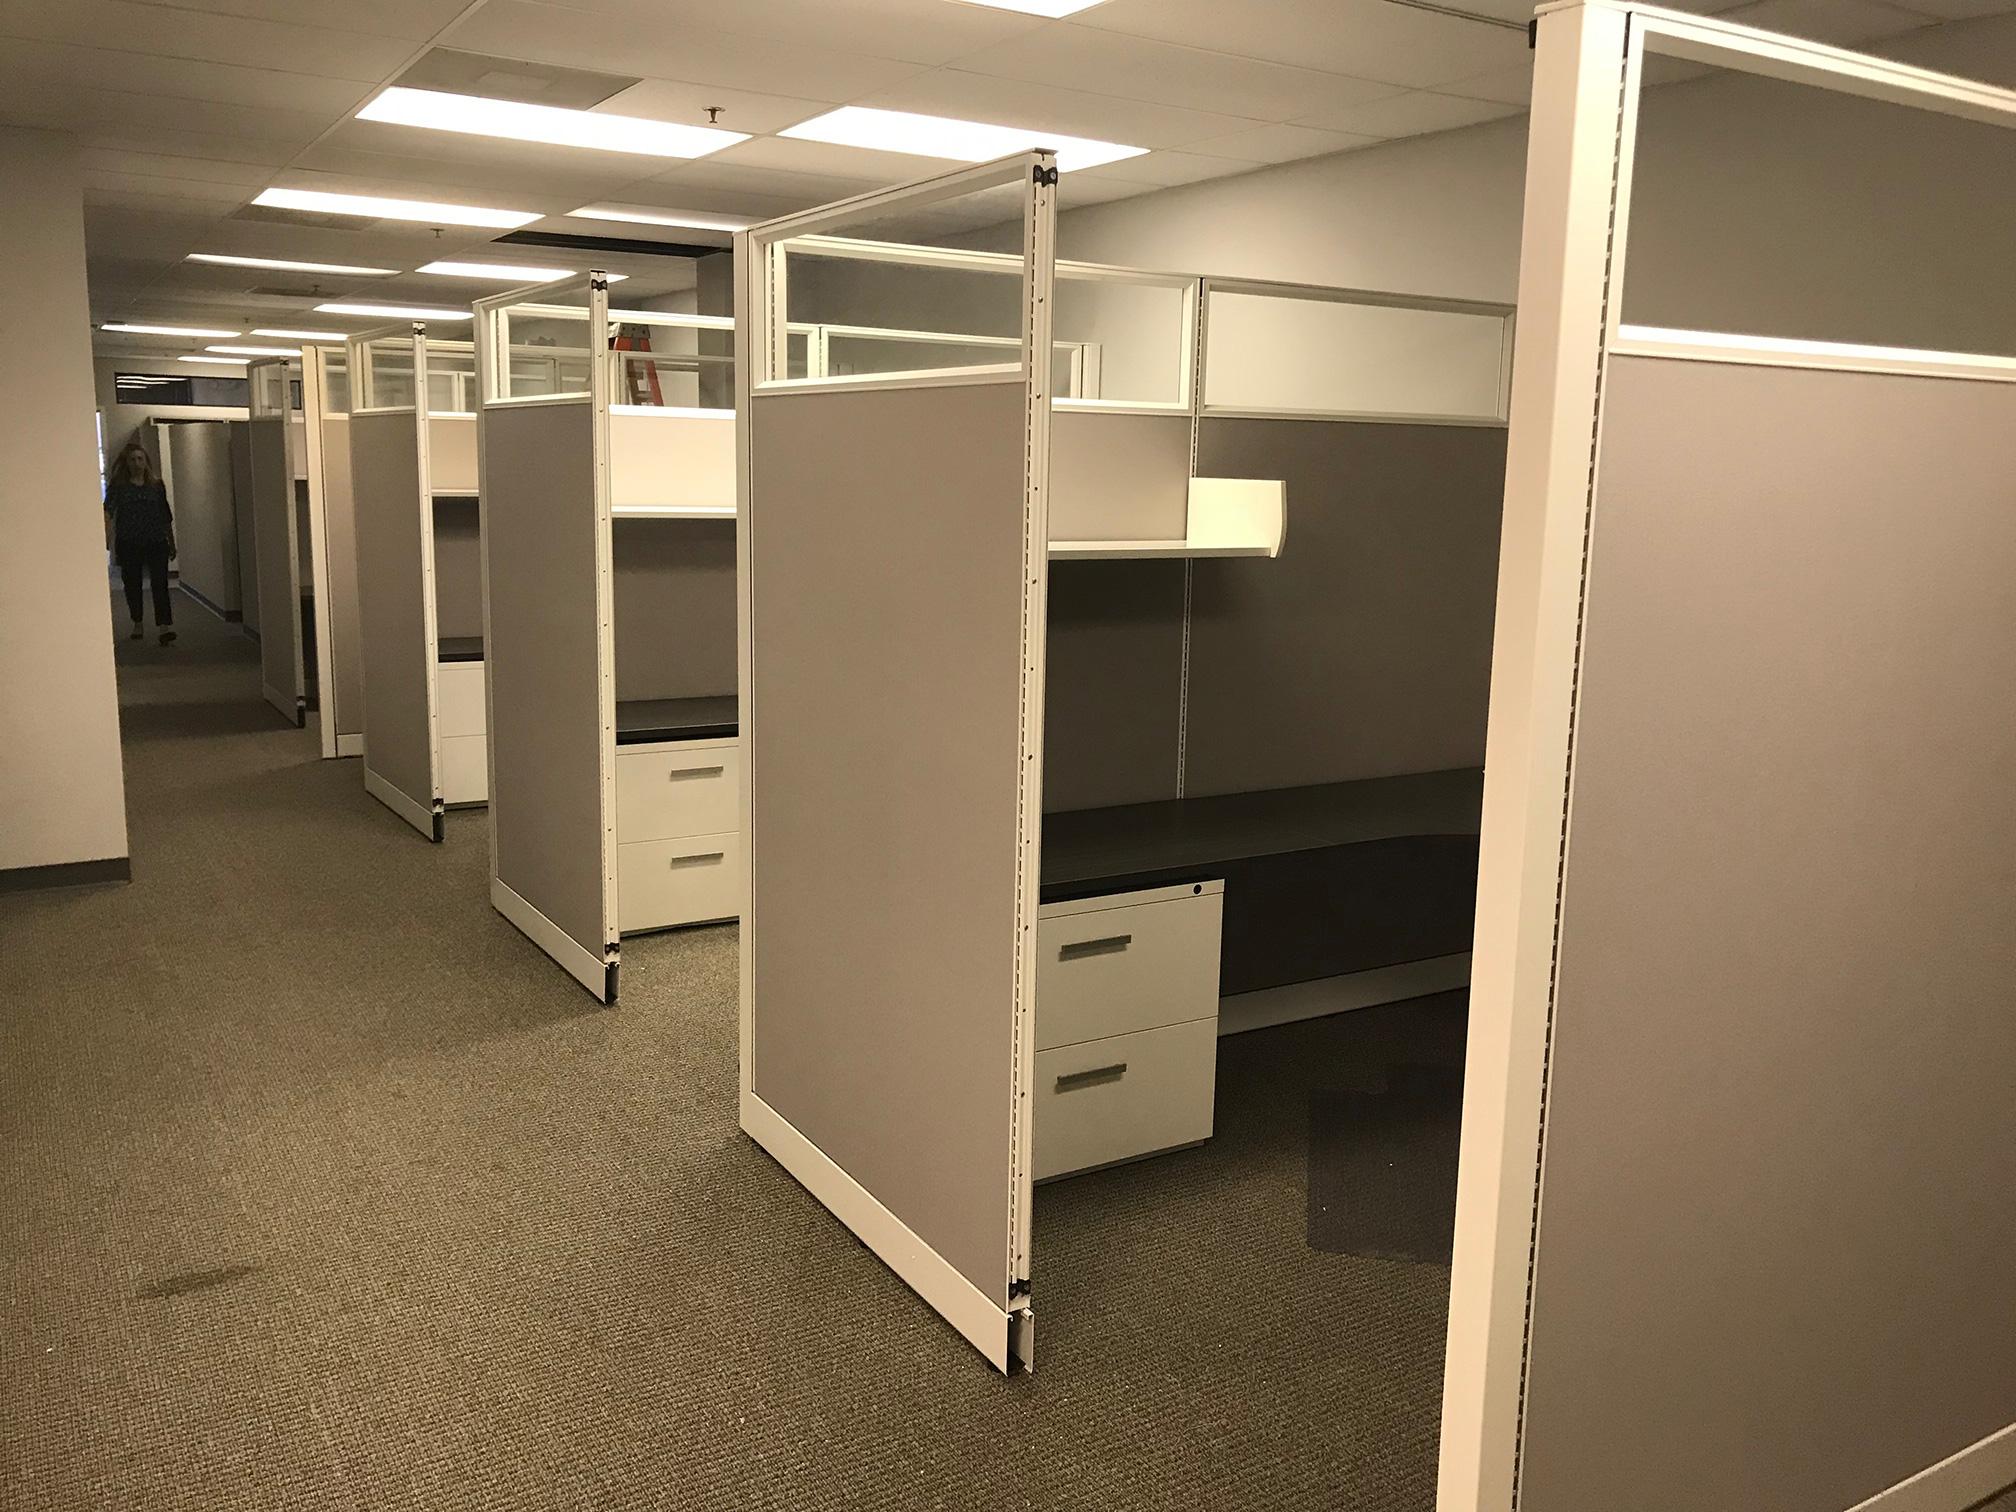 manasota-office-supplies-llc-img-7690.jpg